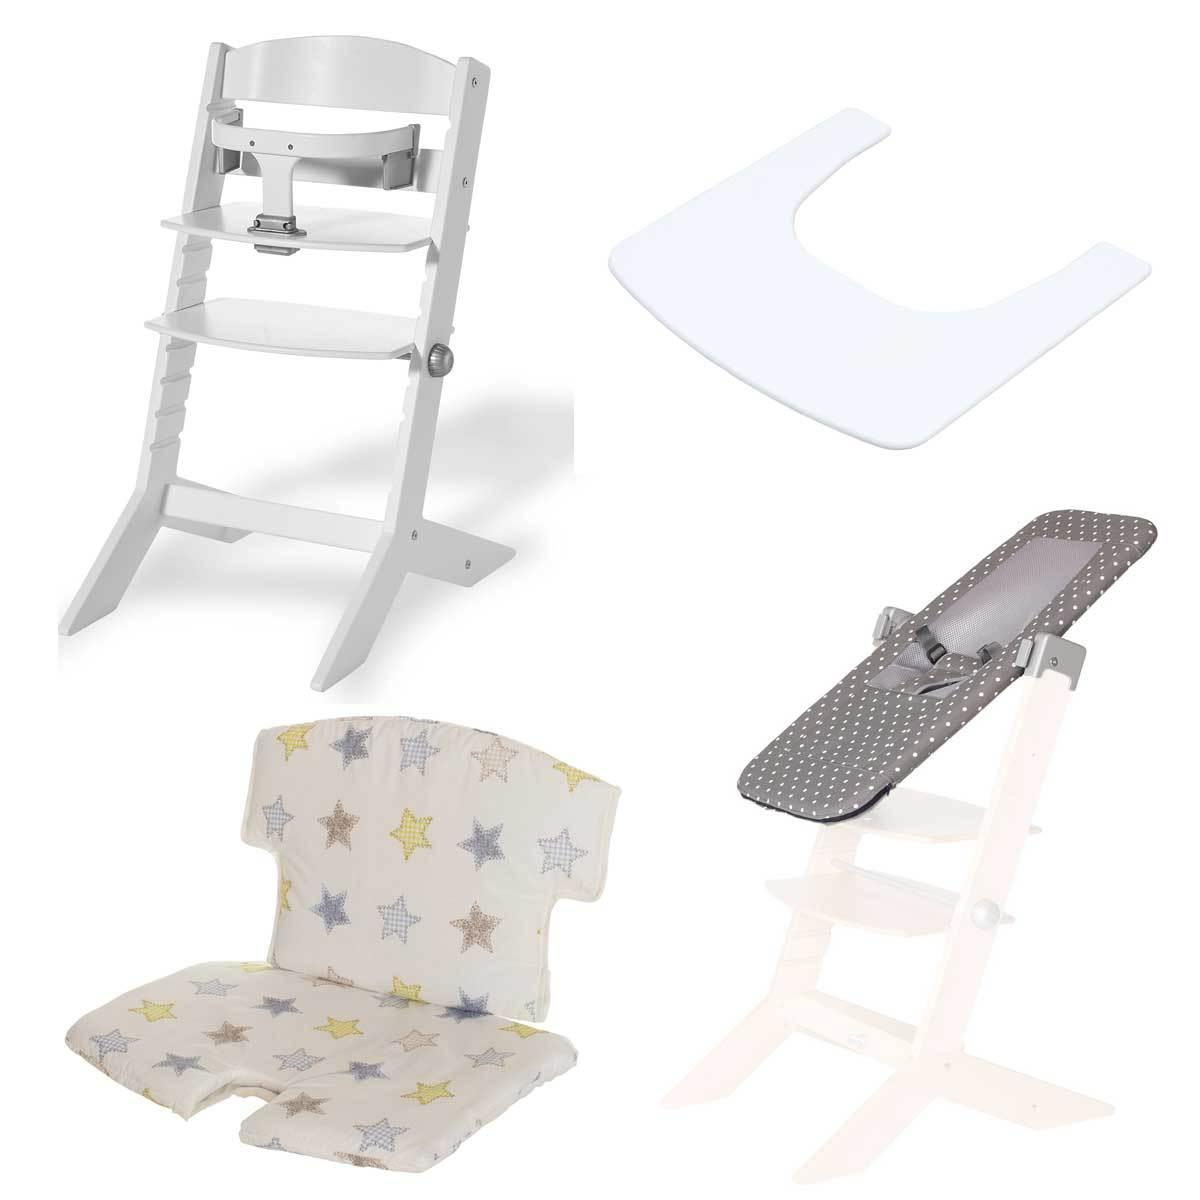 geuther pack chaise haute syt transat sit 39 n 39 sleep tablette coussin de chaise etoiles blanc. Black Bedroom Furniture Sets. Home Design Ideas